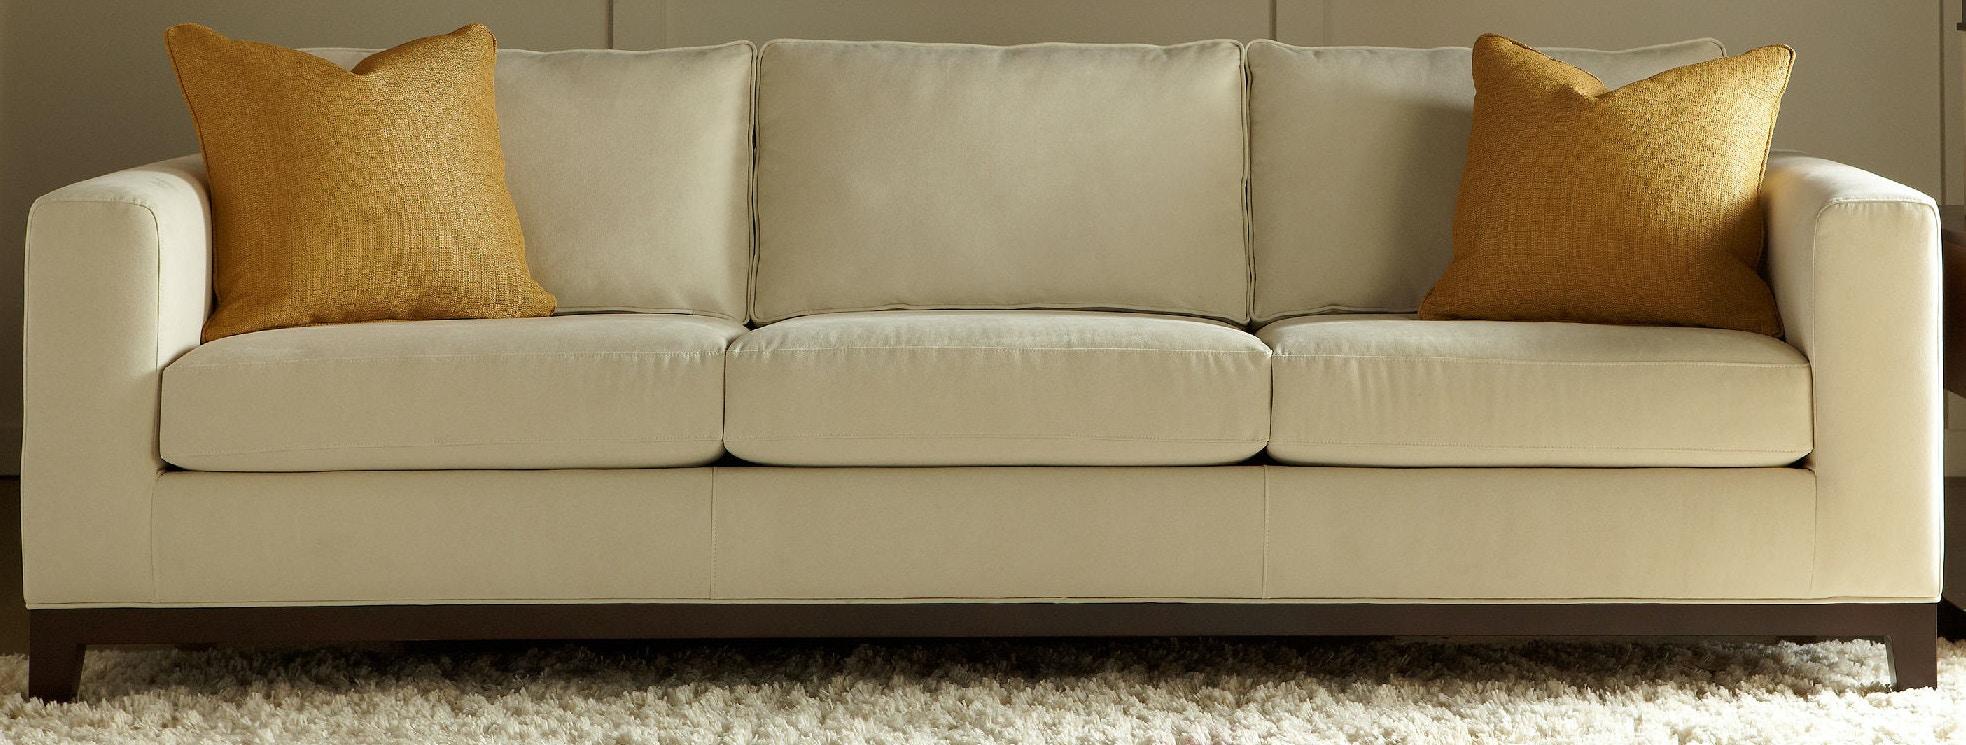 American Leather Three Cushion Sofa BRK SO3 ST